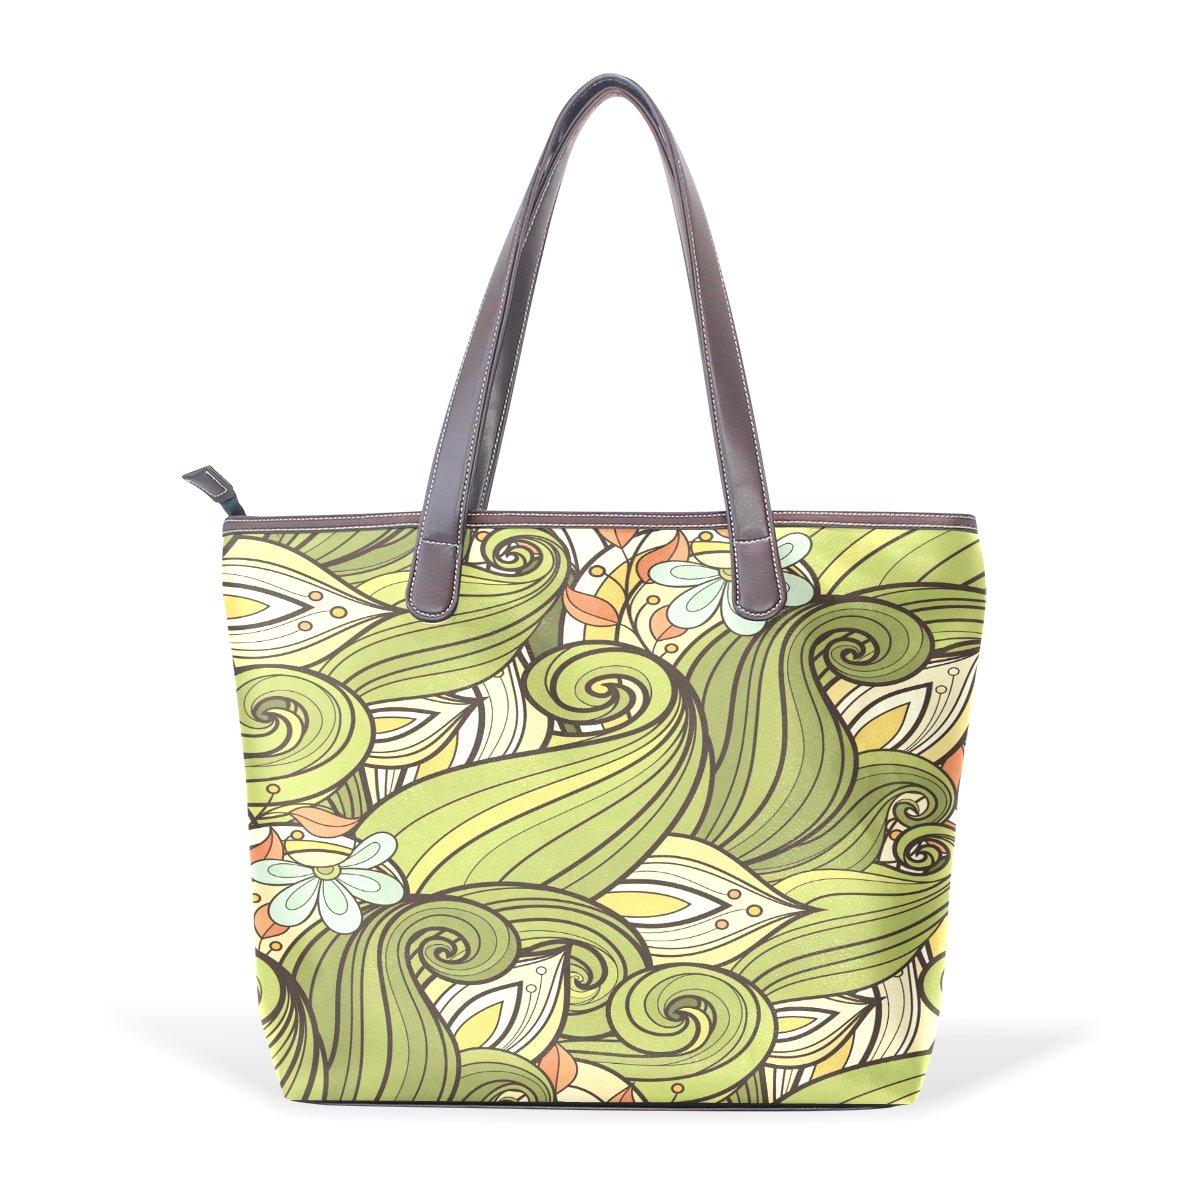 Mr.Weng Household Abstract Leaves Lady Handbag Tote Bag Zipper Shoulder Bag